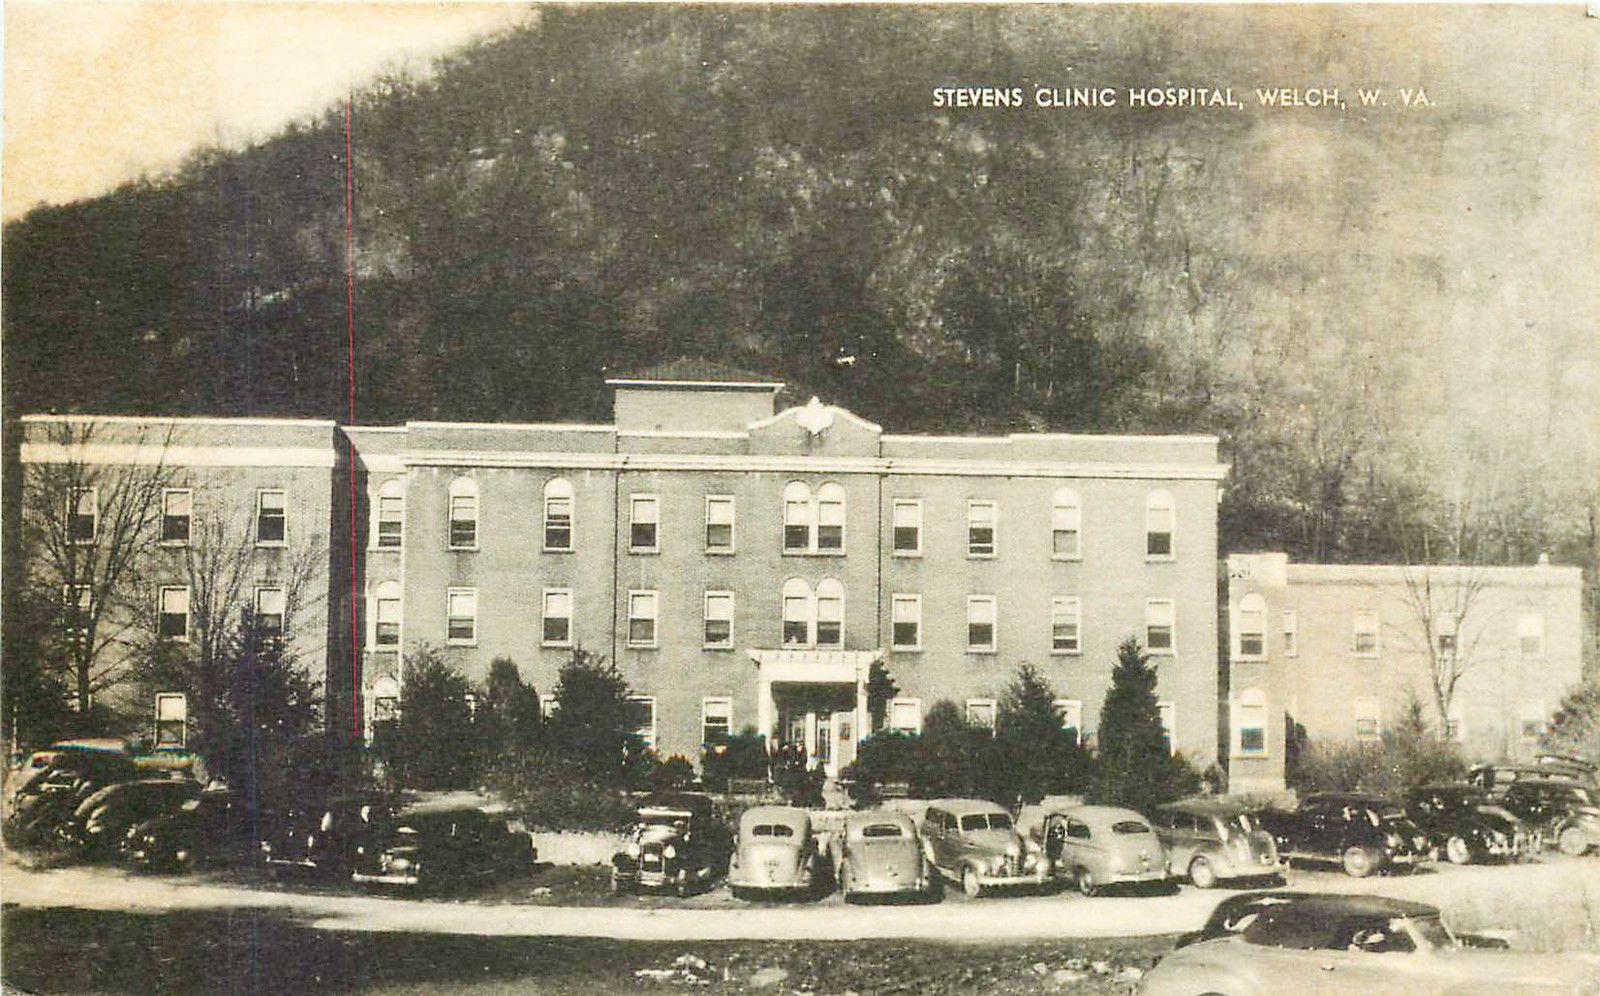 Steven S Clinic Hospital Welch Wv Originally Pinned By W